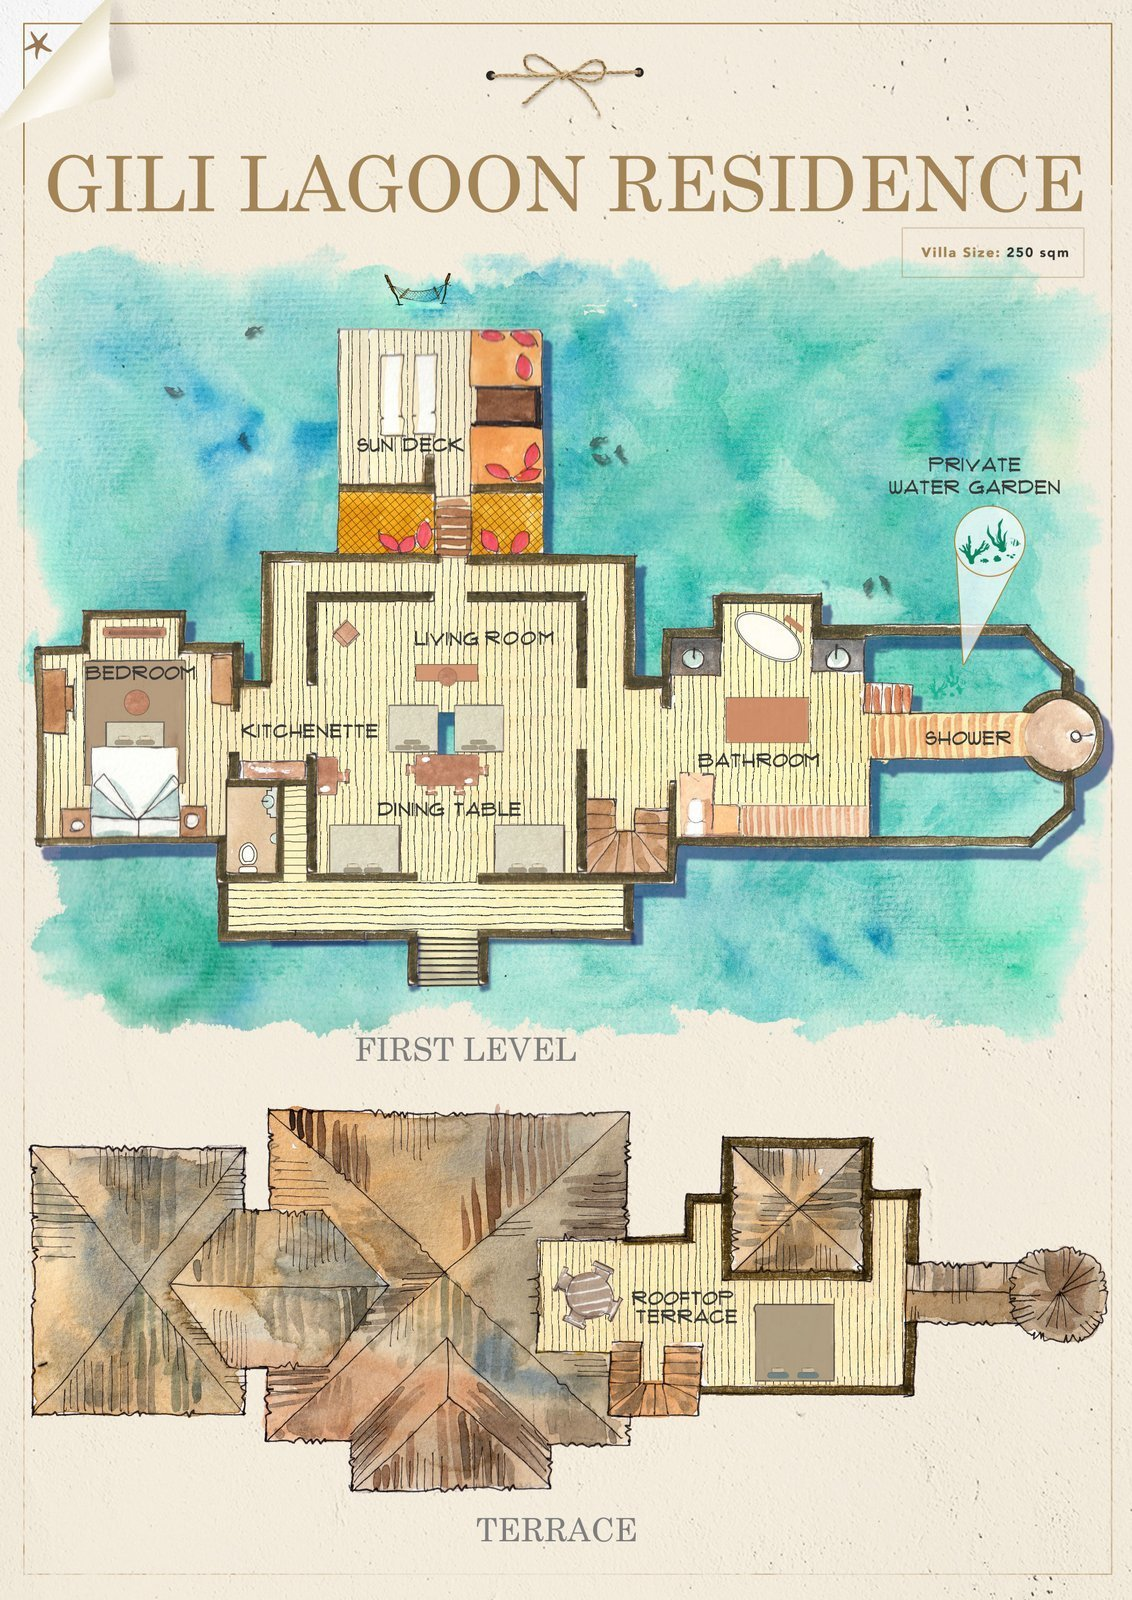 Мальдивы, отель Gili Lankanfushi Maldives, план-схема номера Gili Lagoon Residence